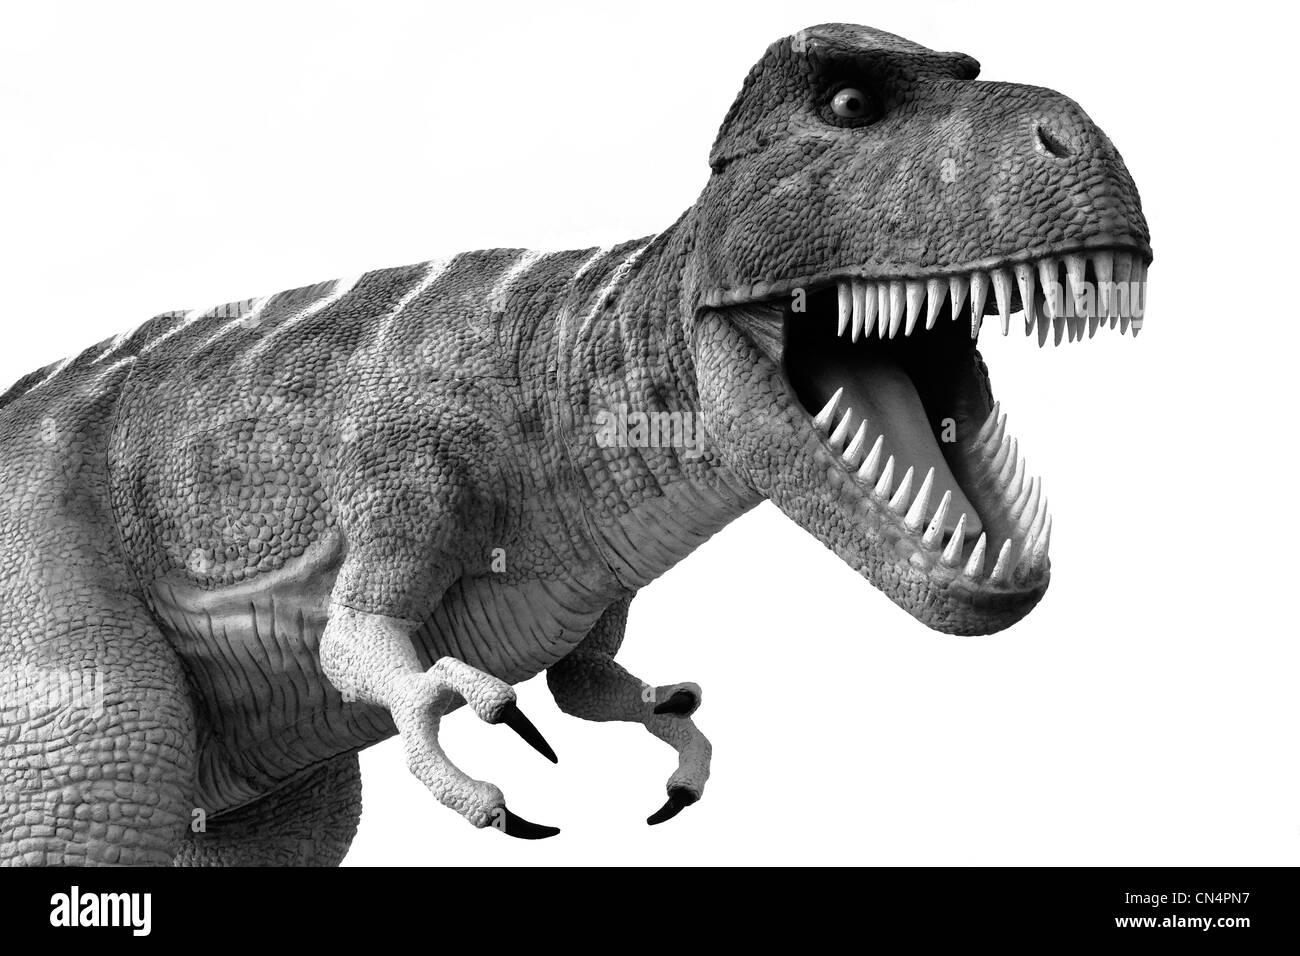 Menacing Tyrannosaurus Rex dinosaur - Stock Image